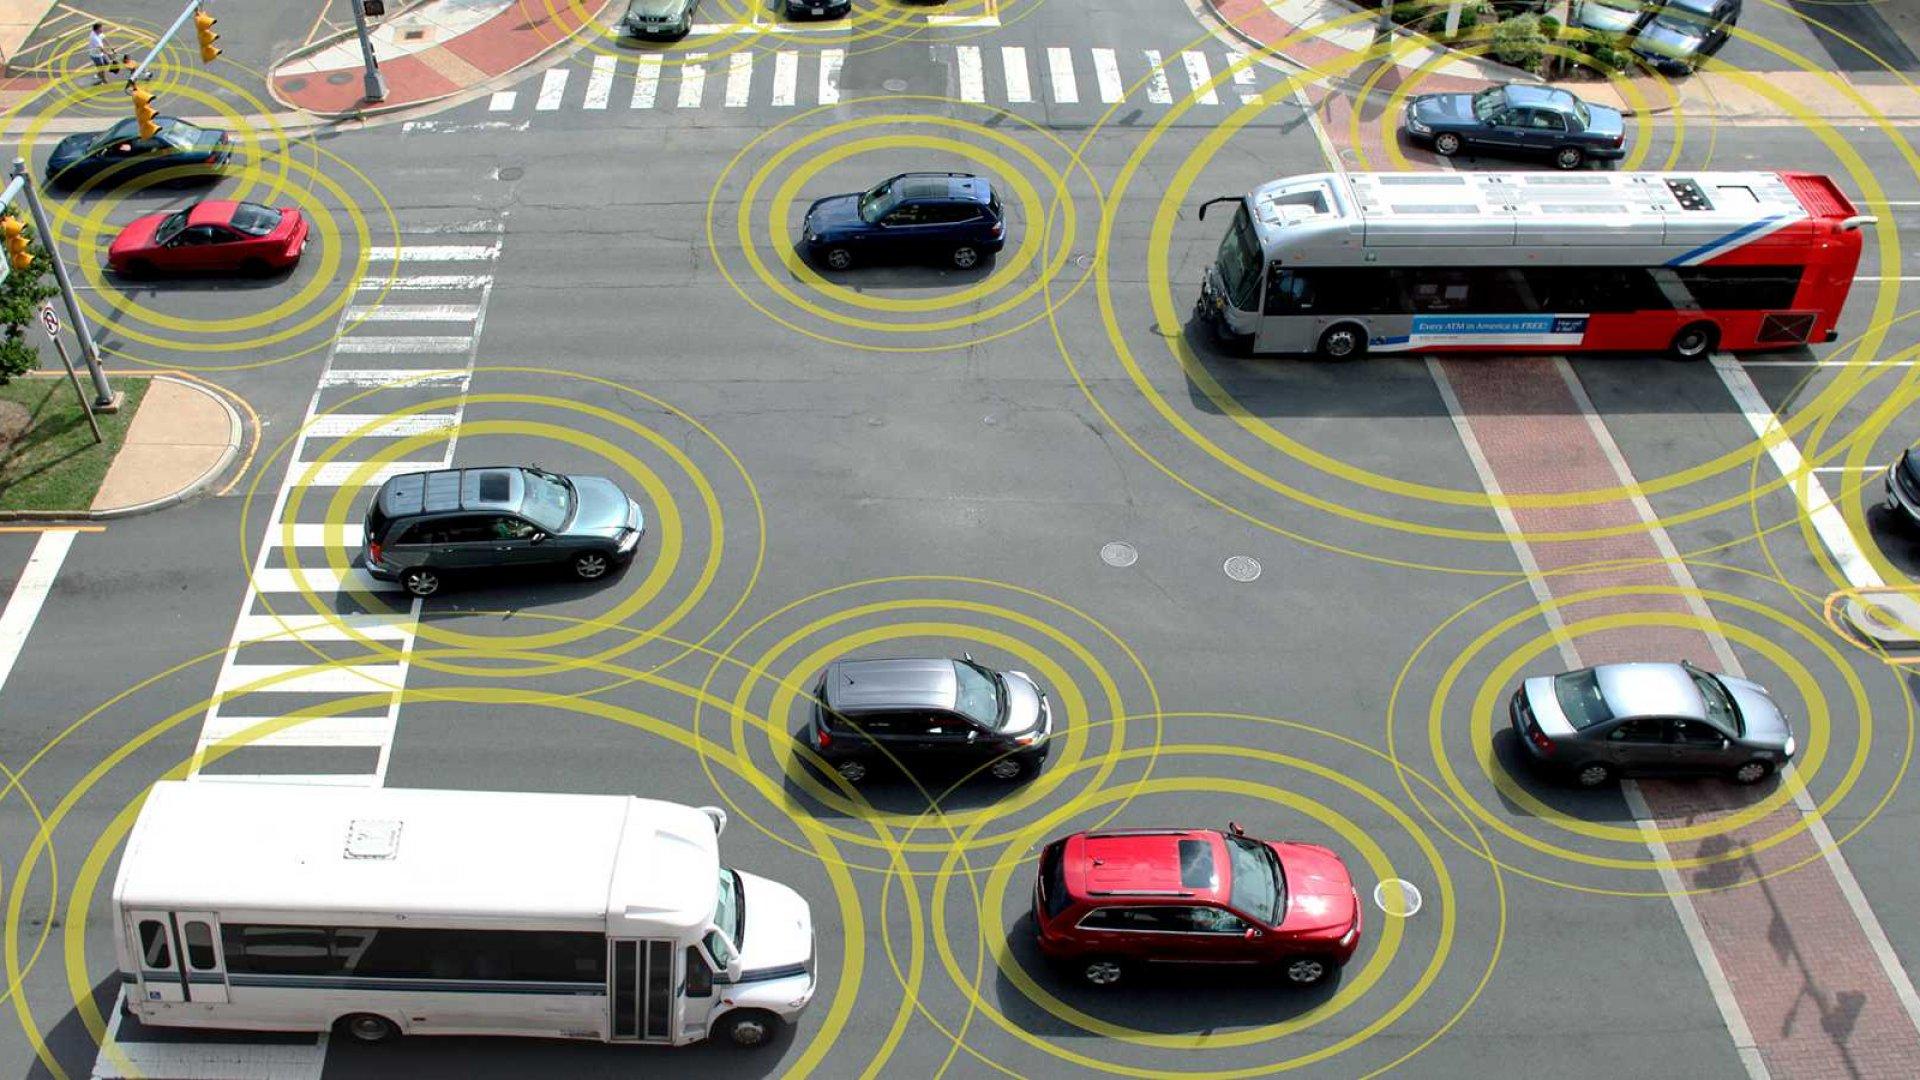 Michigan Means 21st Century Automotive Innovation